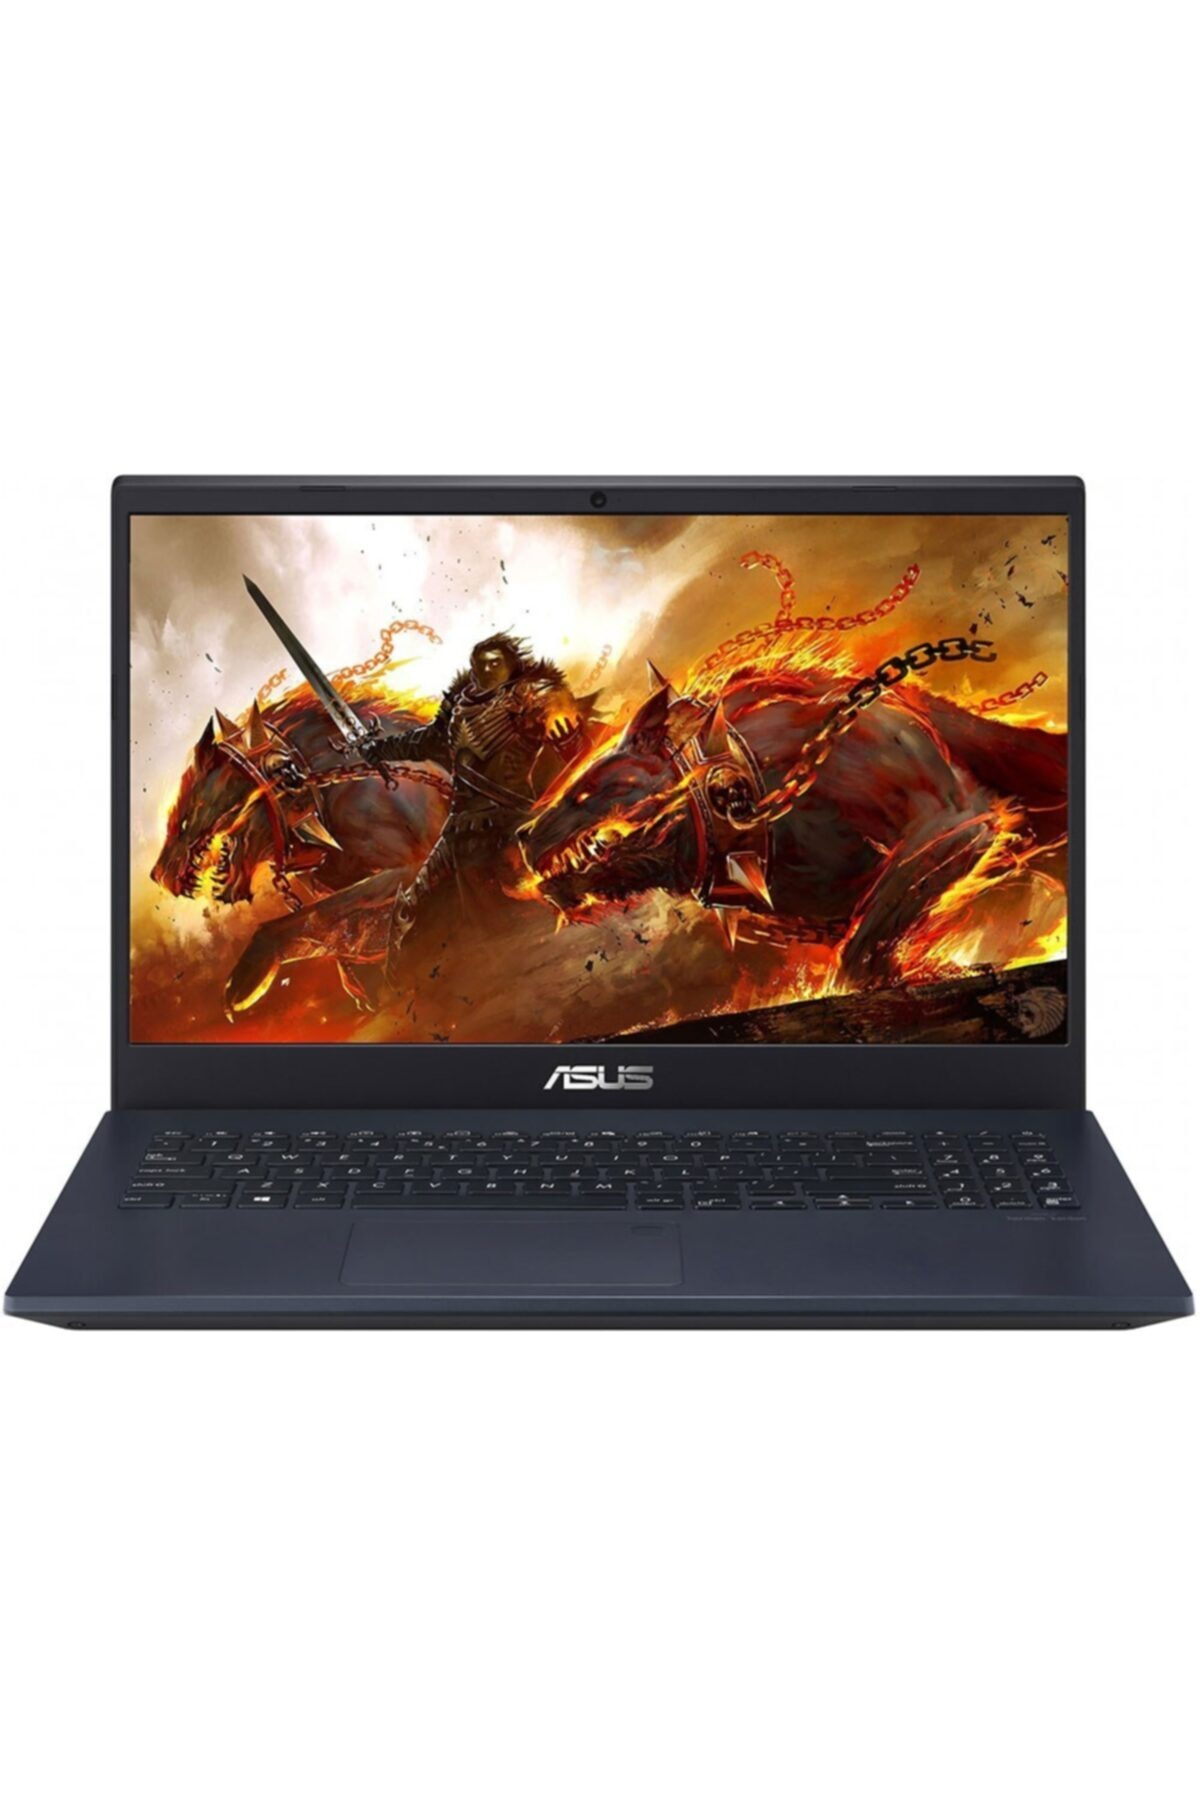 X571GD-BQ524 Intel Core i5 9300H 8GB 256GB SSD GTX1050 Freedos 15.6